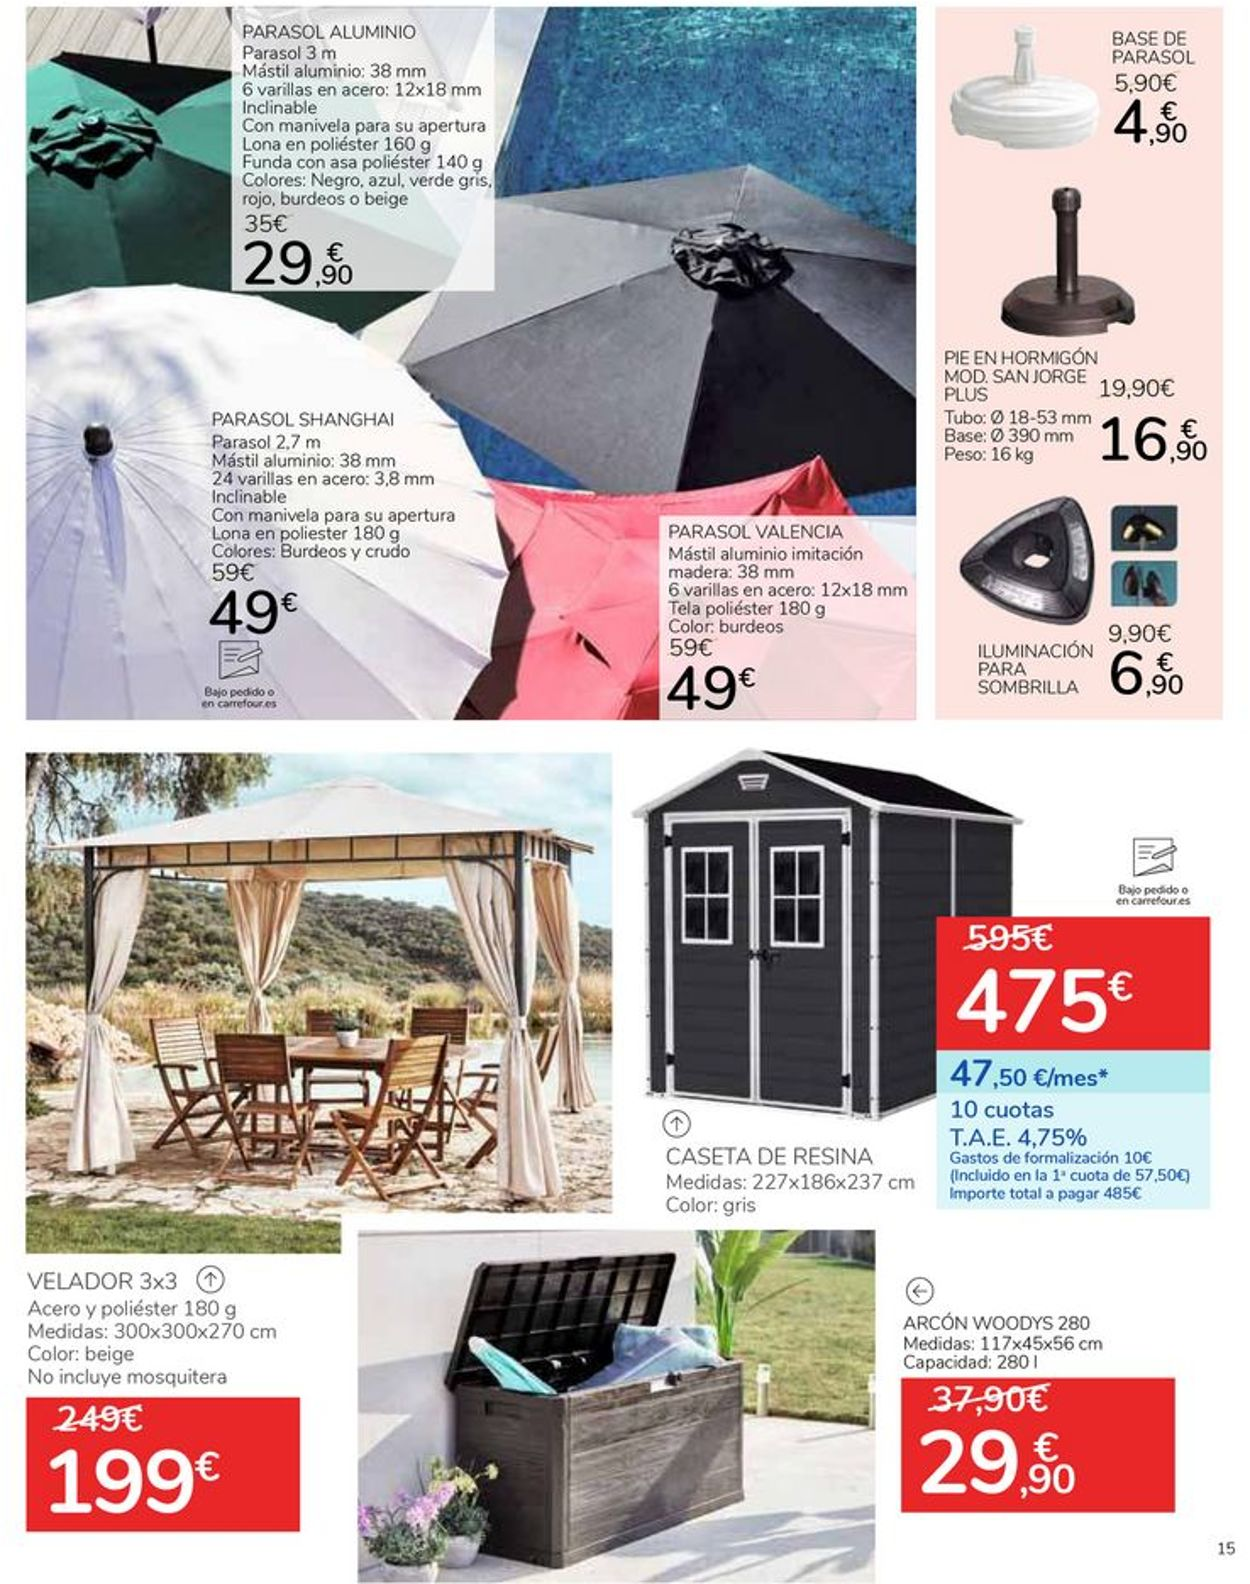 Carrefour Folleto - 14.05-11.06.2020 (Página 17)